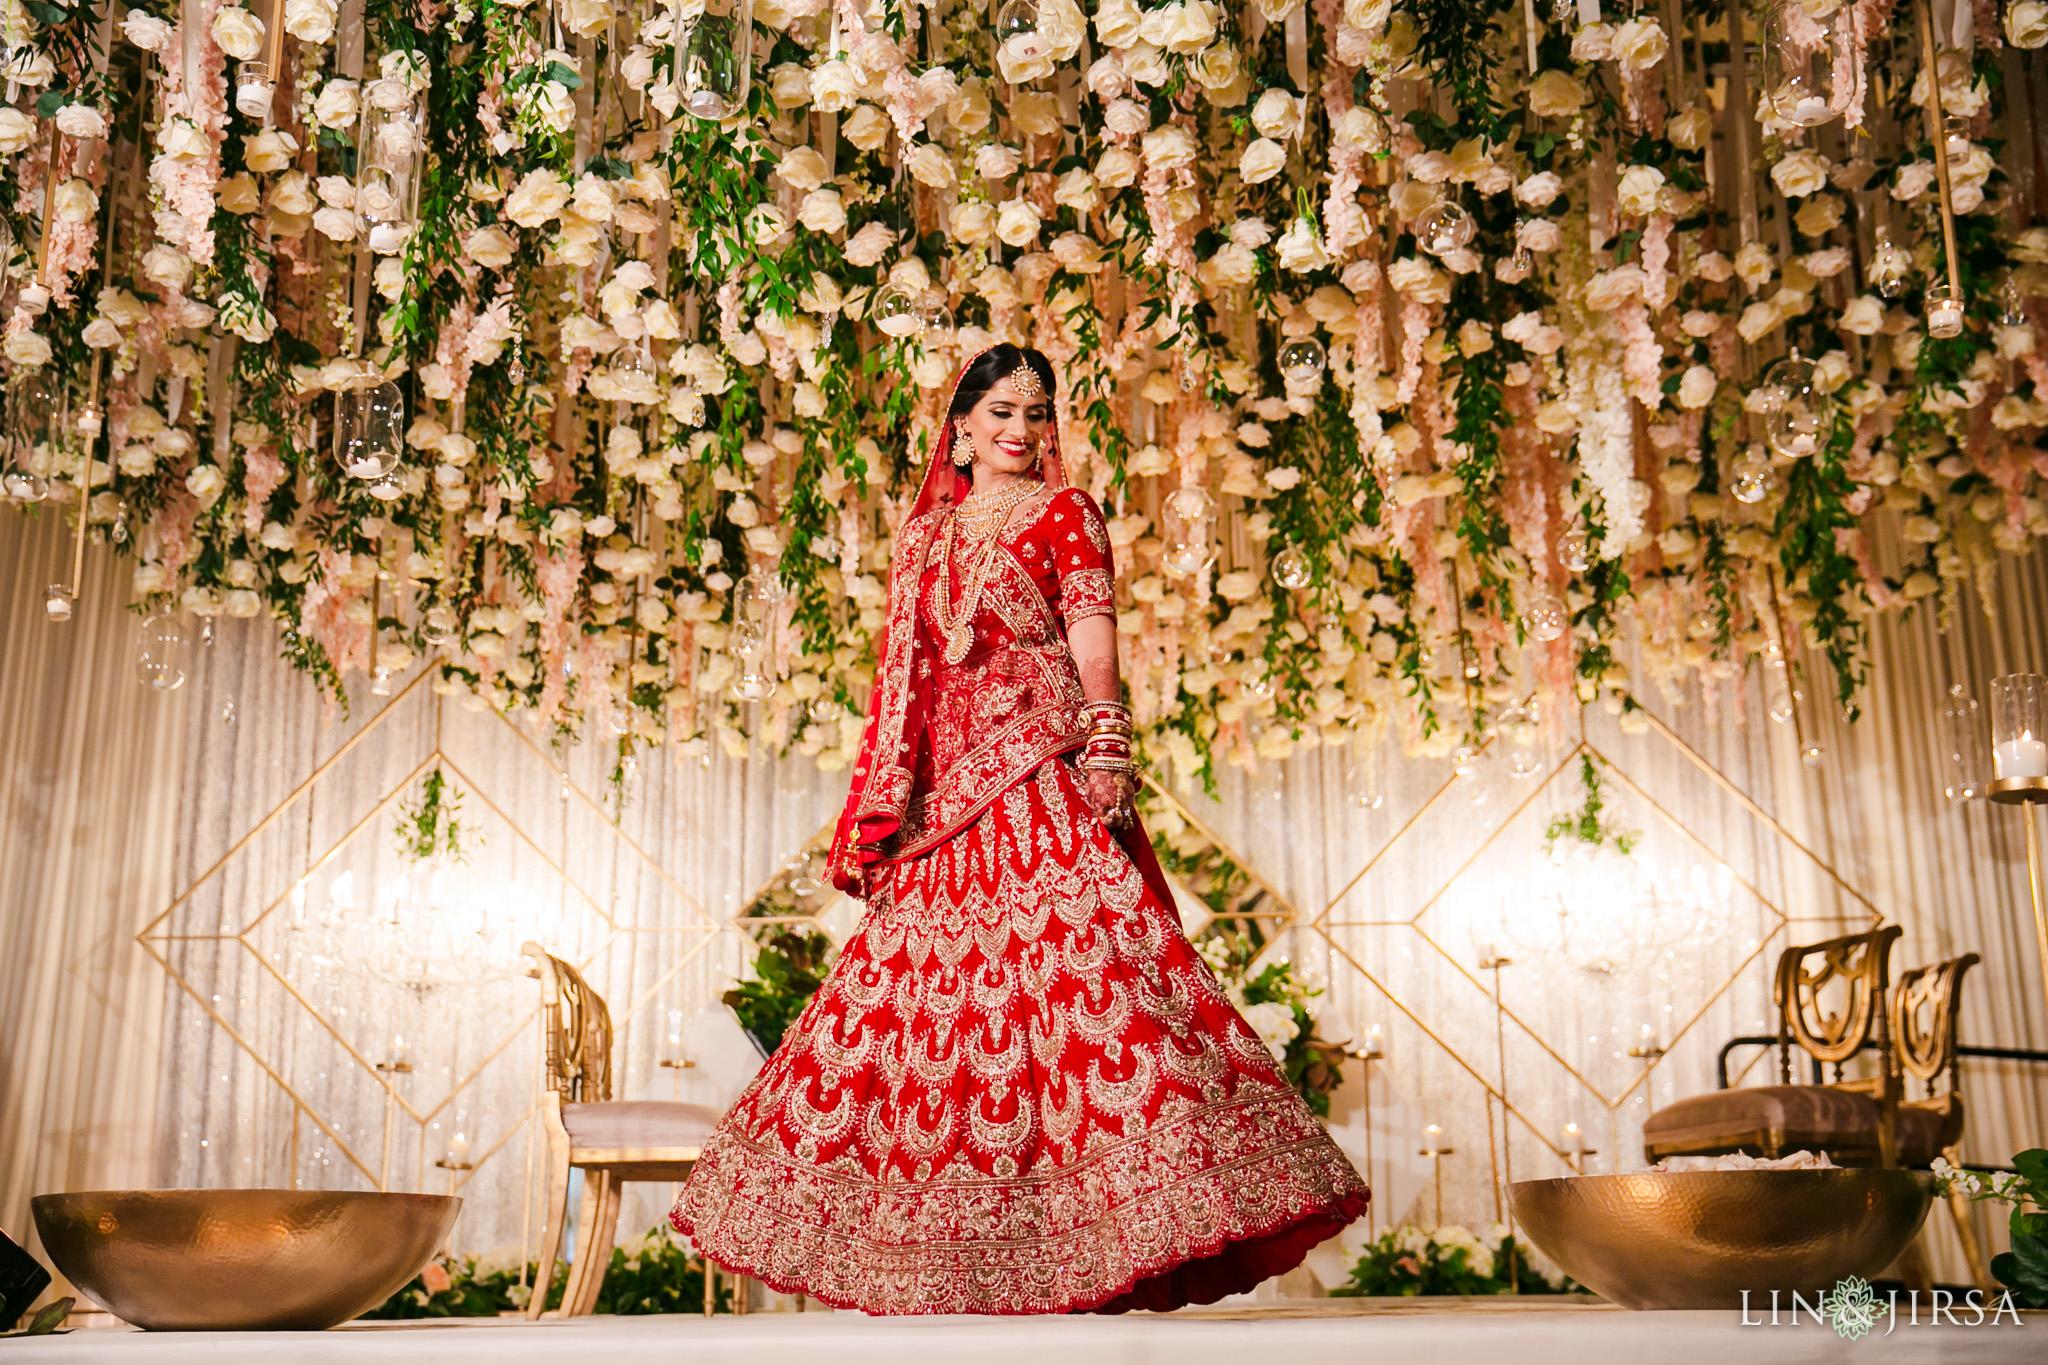 004 san jose marriott indian wedding photography